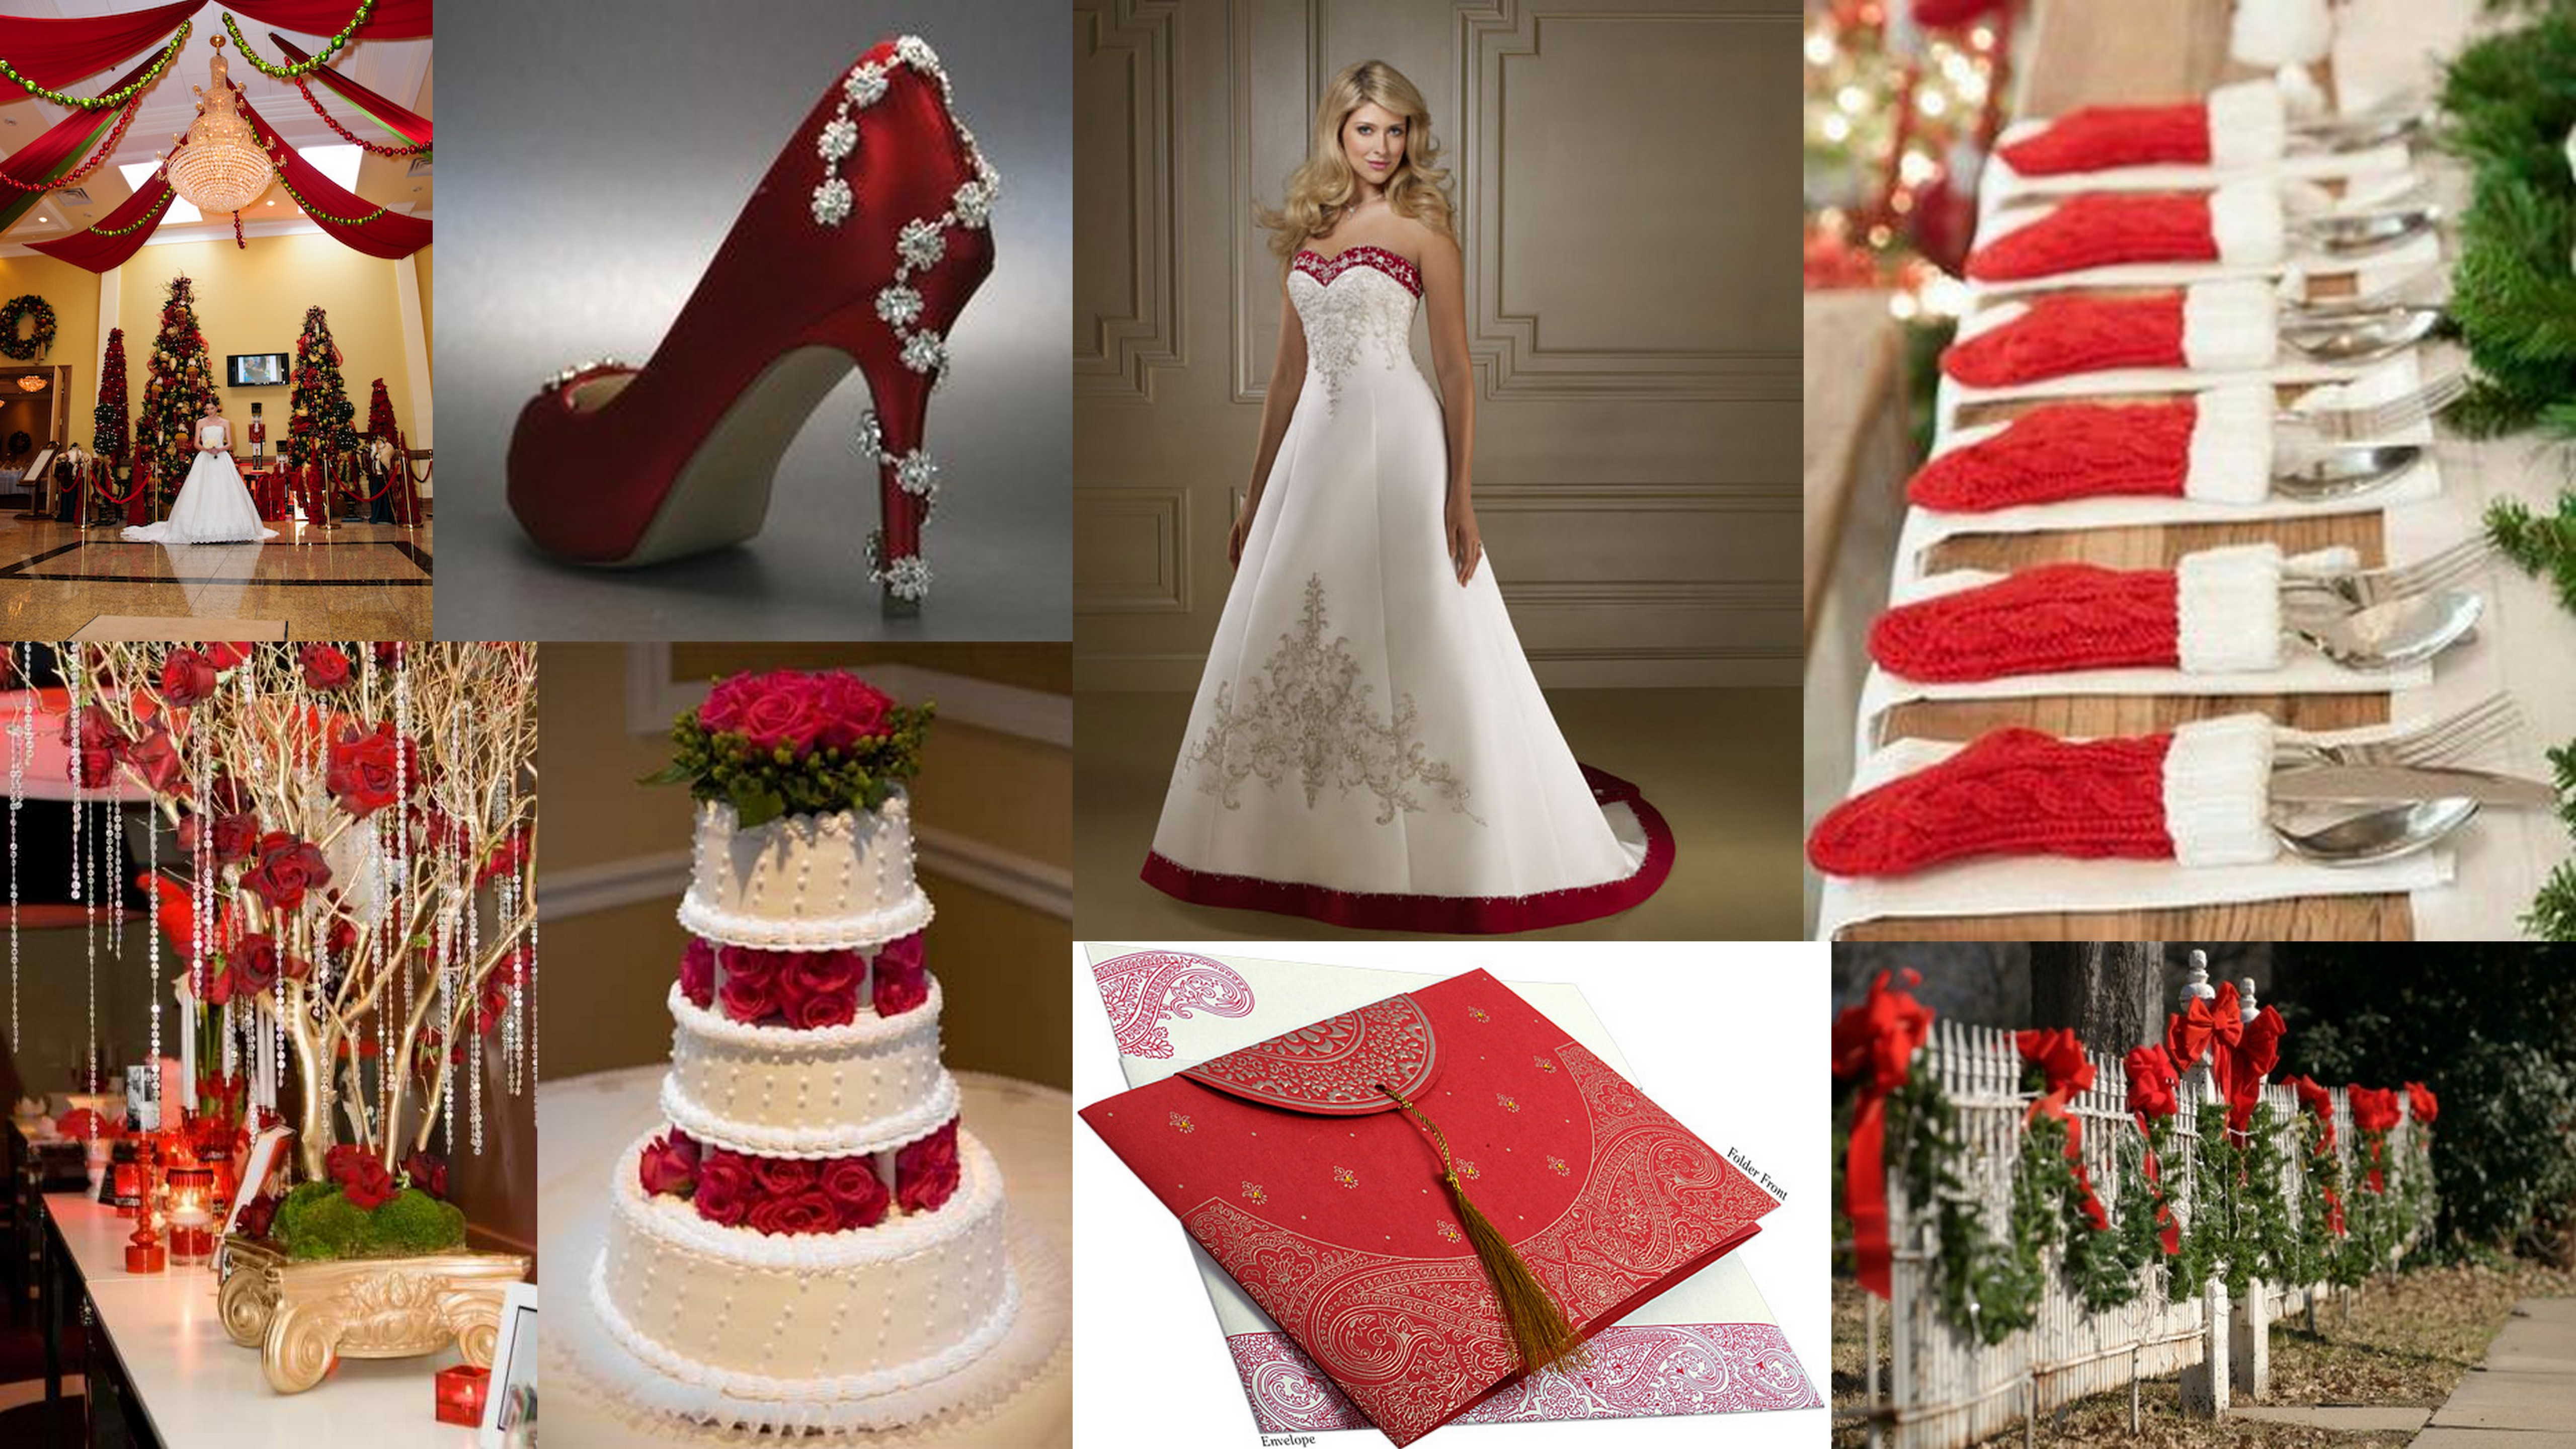 ChristmasThemed Wedding  Christian Wedding 123weddingcards